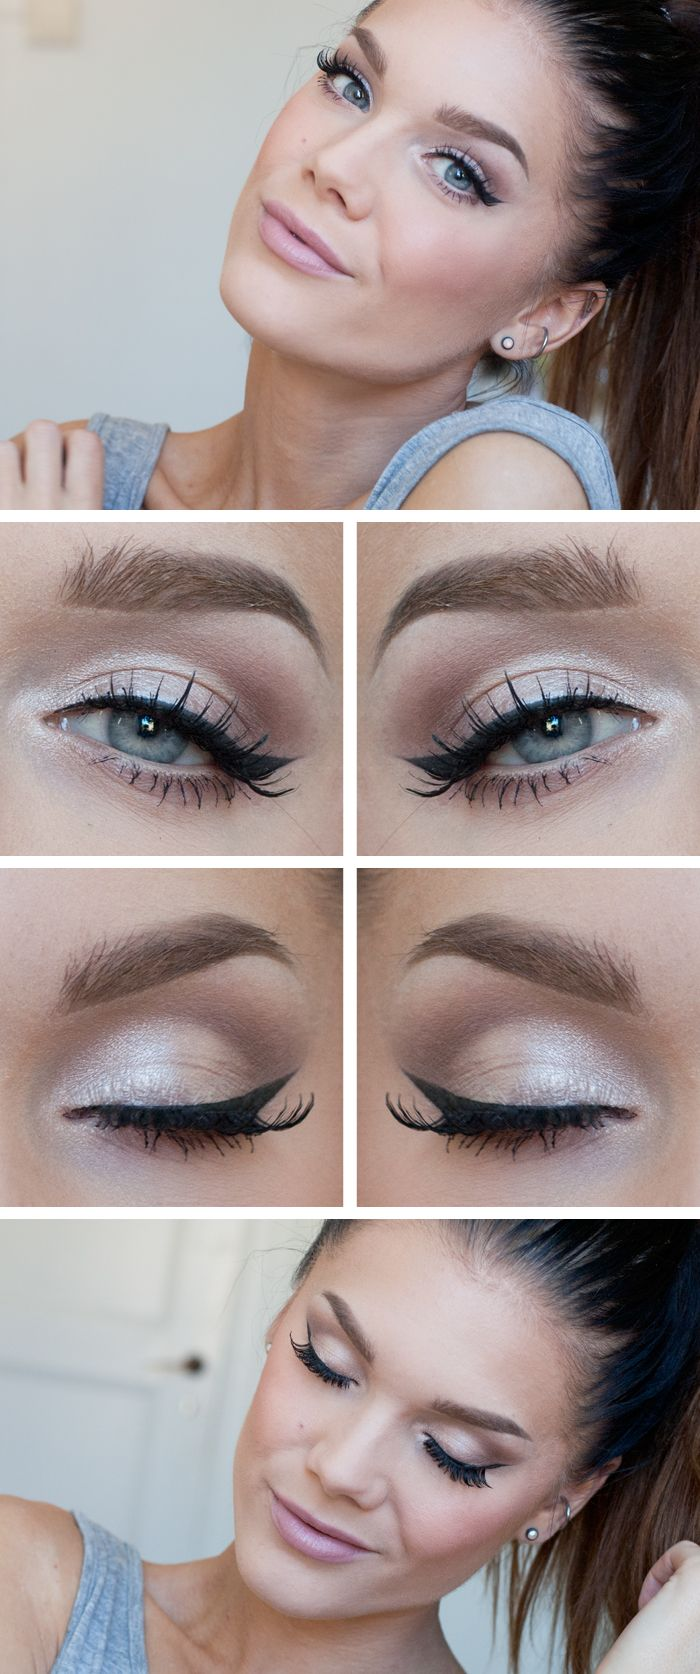 How to make light makeup 9